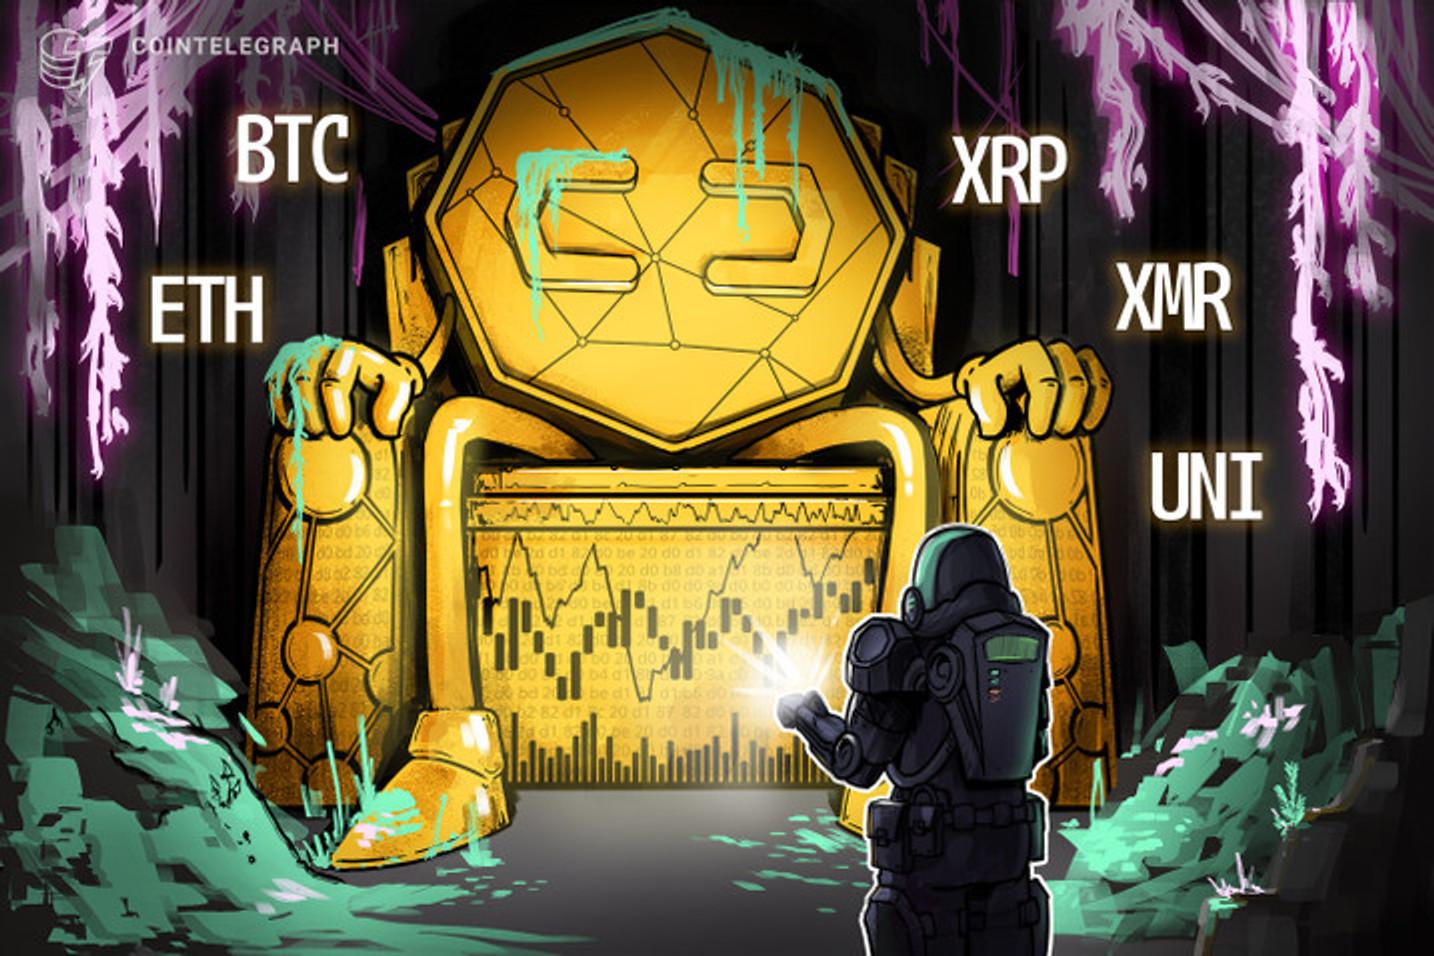 Bitcoin bate novo recorde supera US$ 30 mil e passa de R$ 163 mil no Brasil